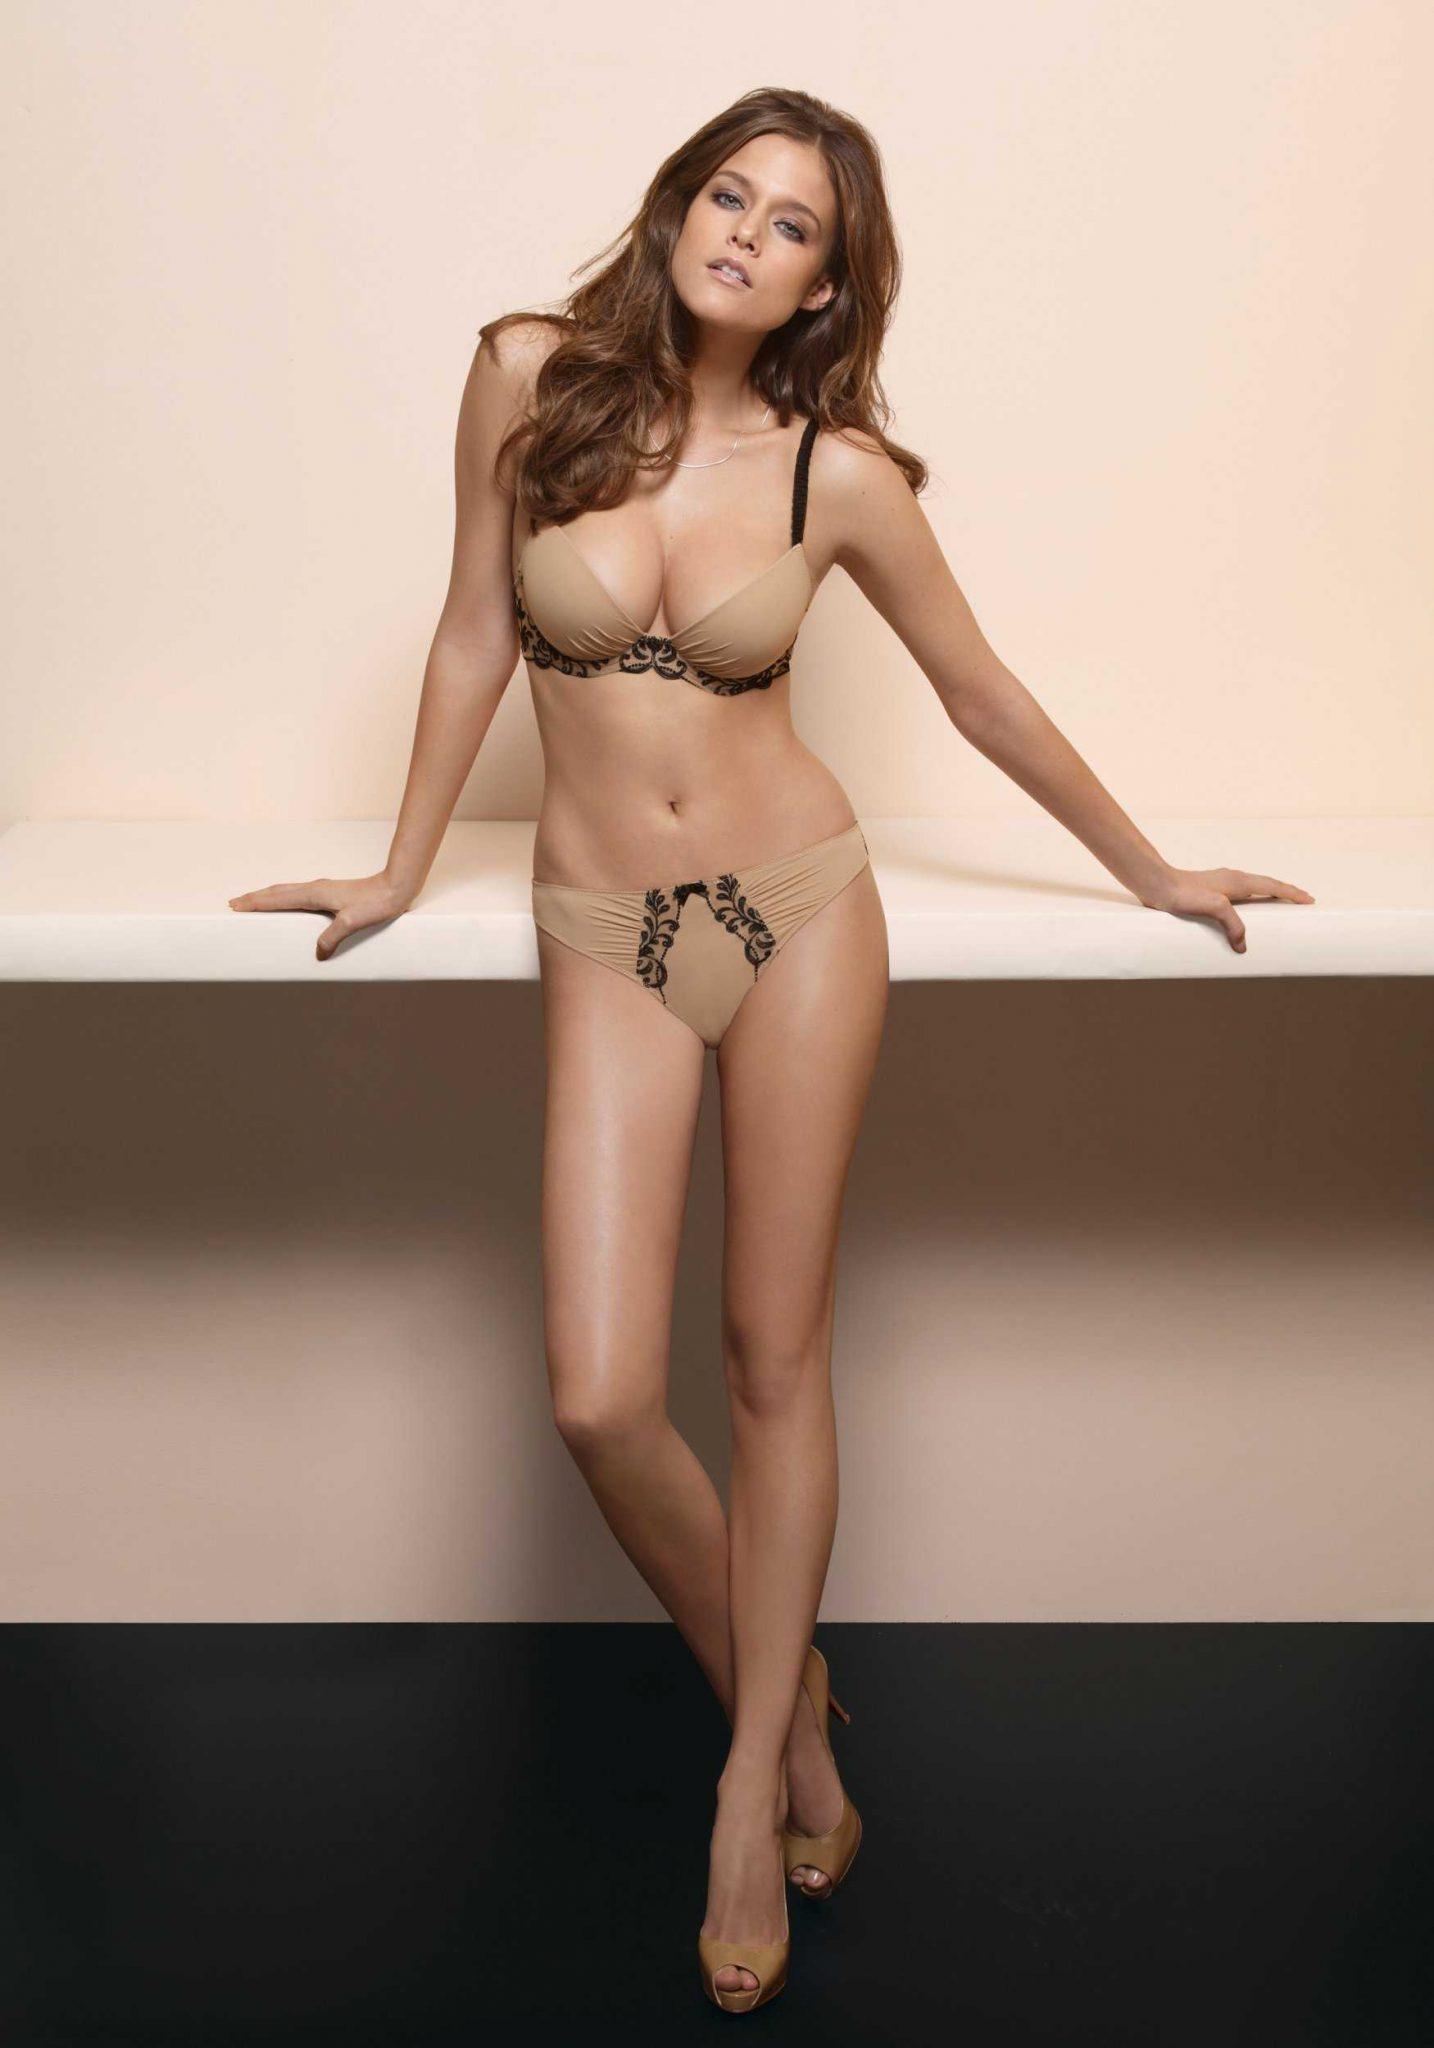 Kim Cloutier big busty pics (2)